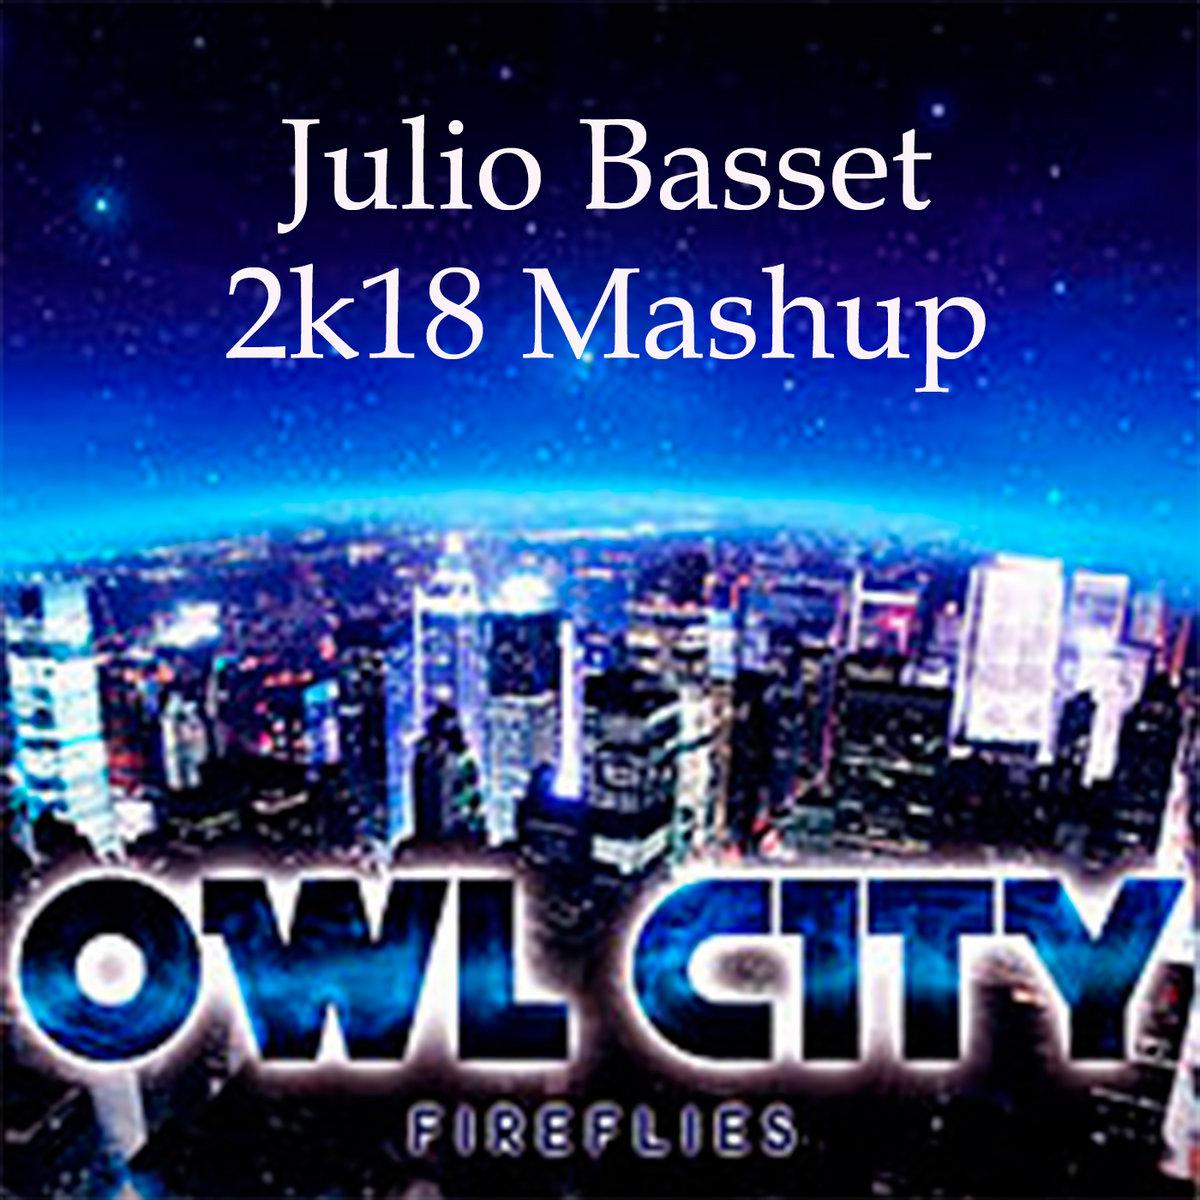 Own City, M  Avrahami, A  Natal, Leanh - Fireflies (Julio